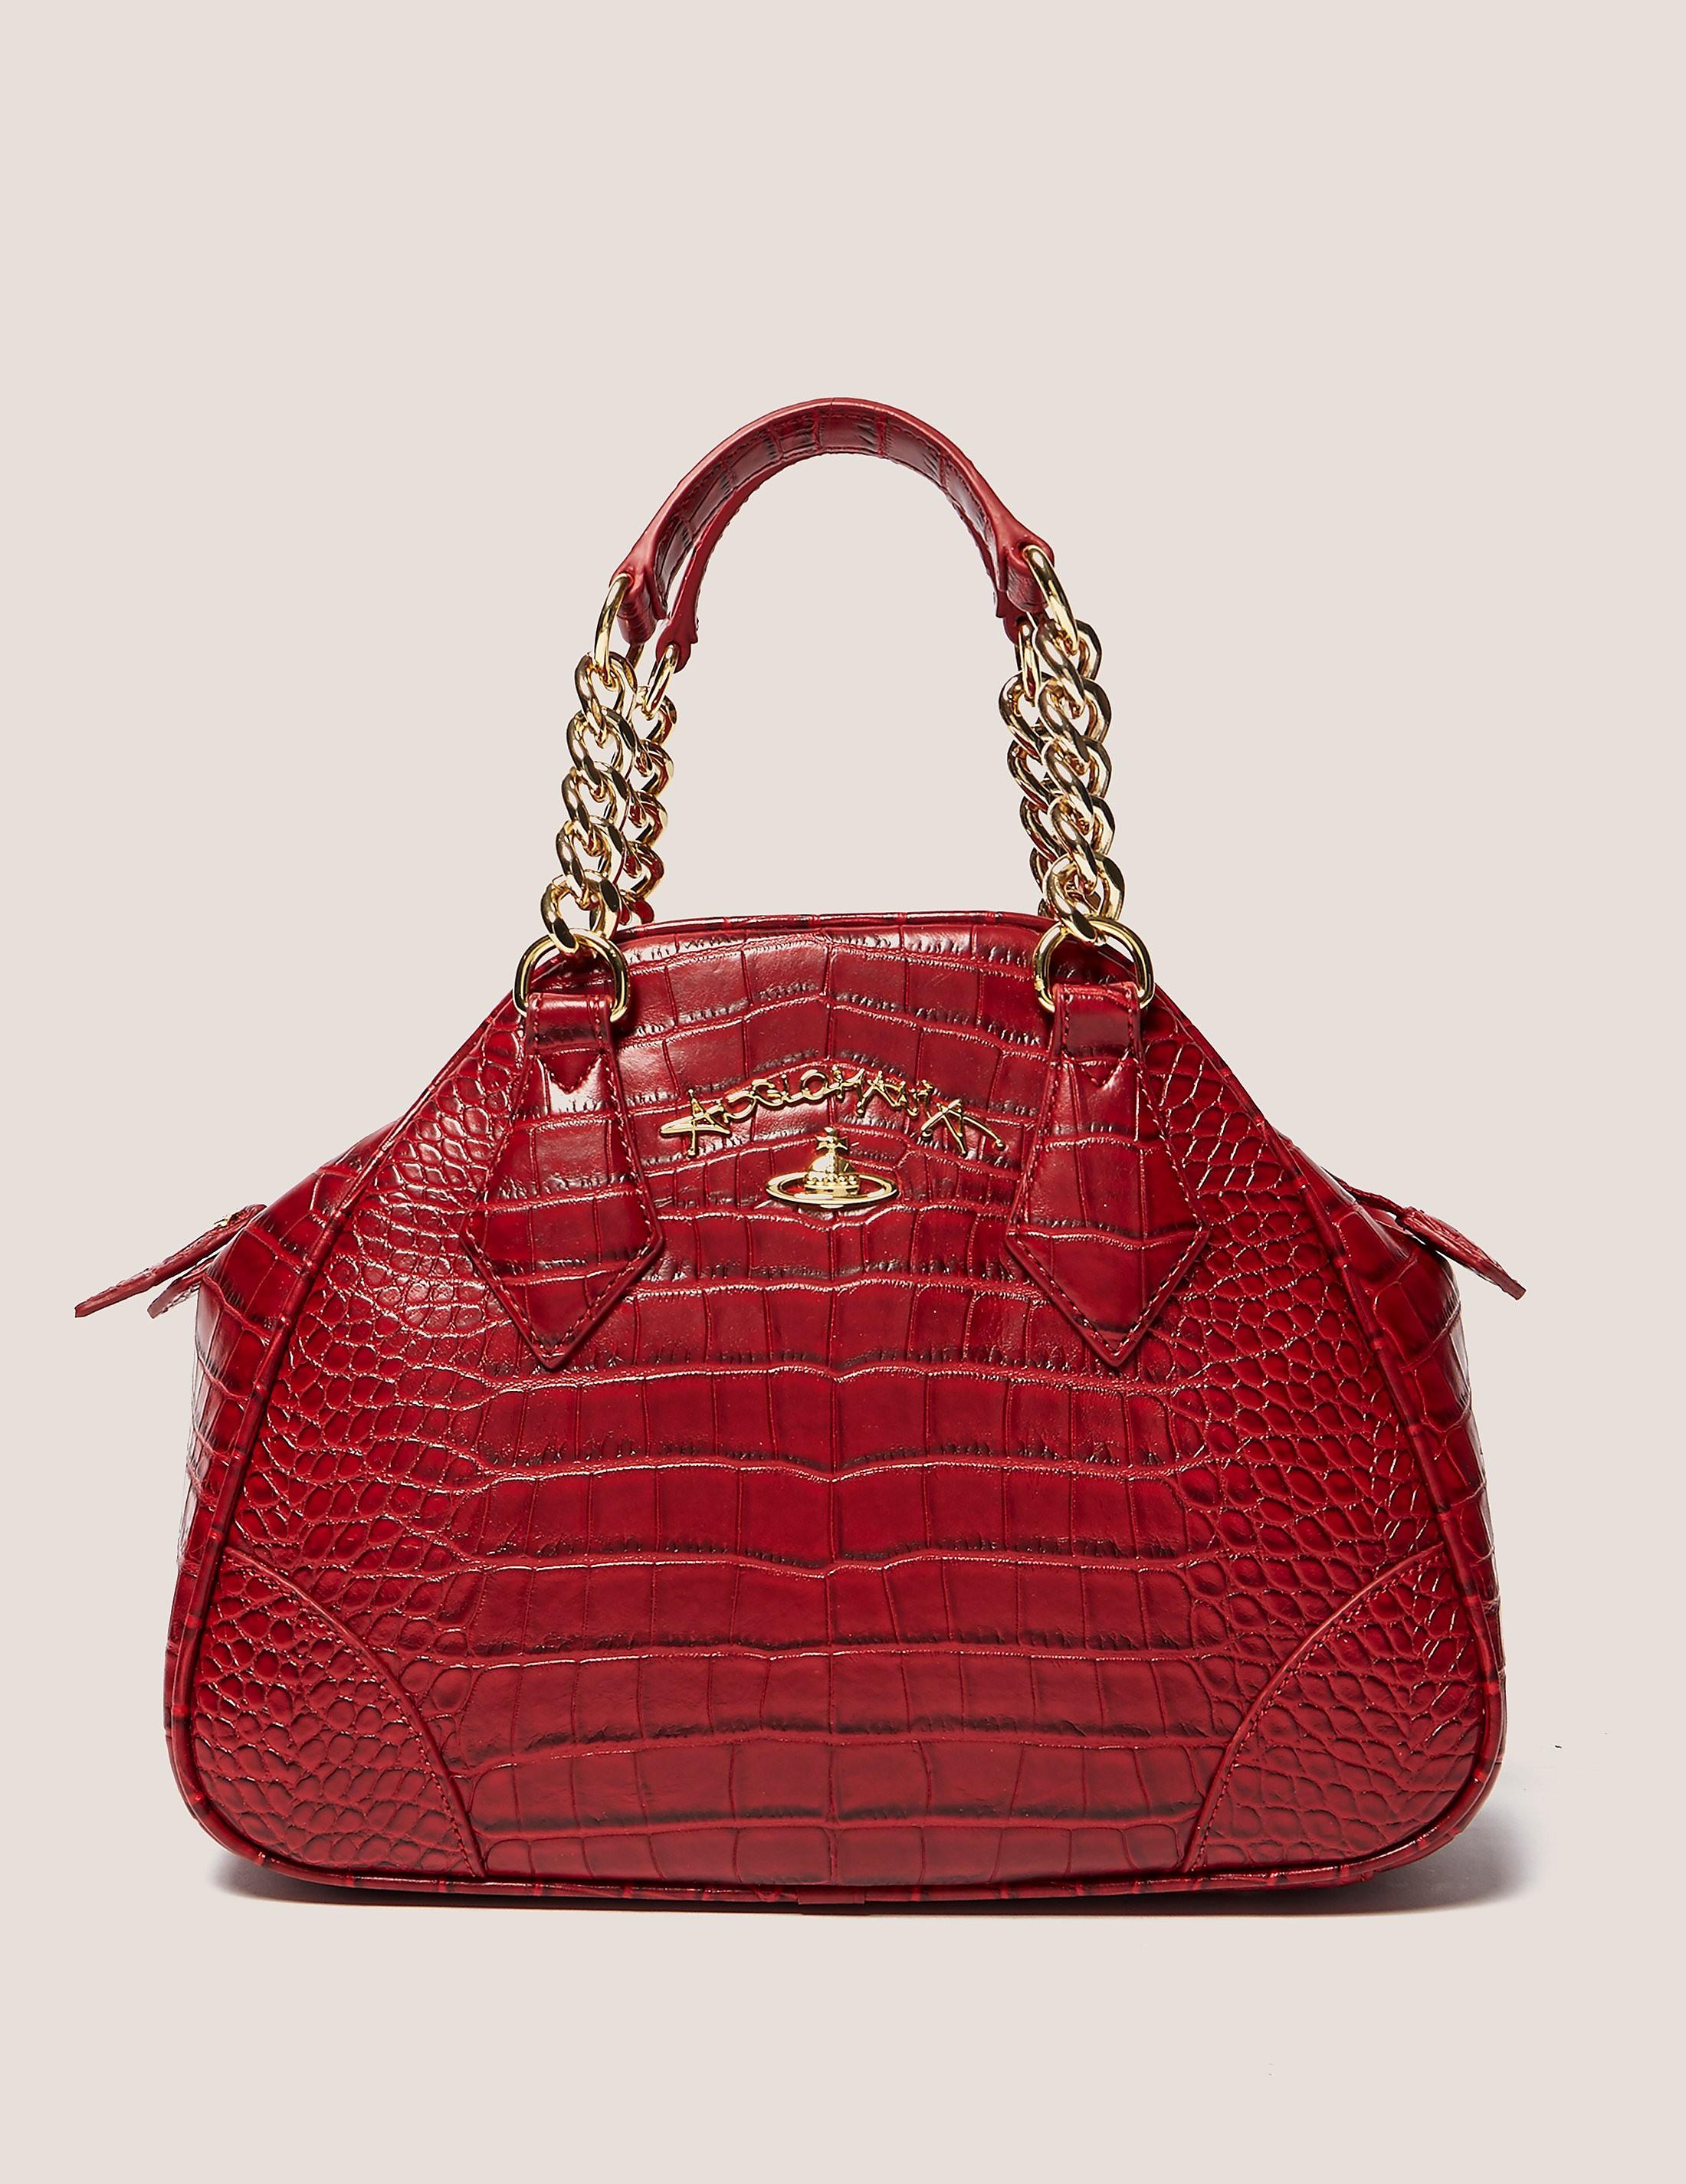 Vivienne Westwood Anglomania Dorset Crocodile Bag